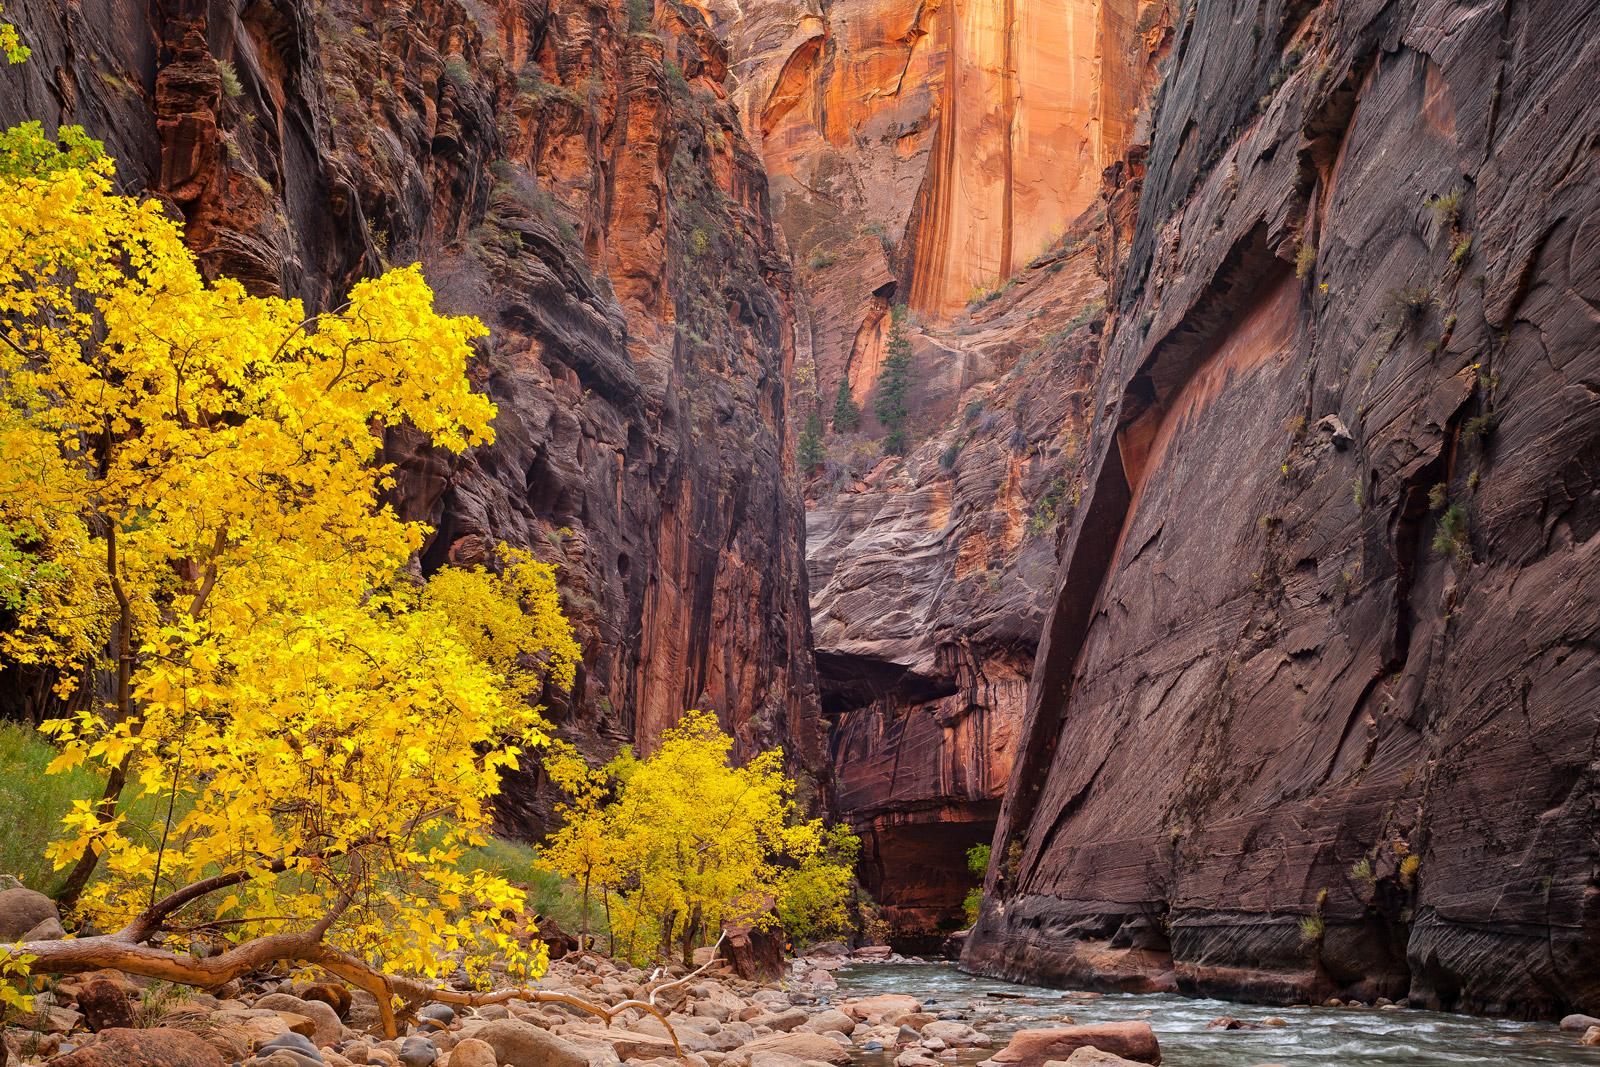 Utah, Zion Park, The Narrows, Fall Color, limited edition, photograph, fine art, landscape, photo